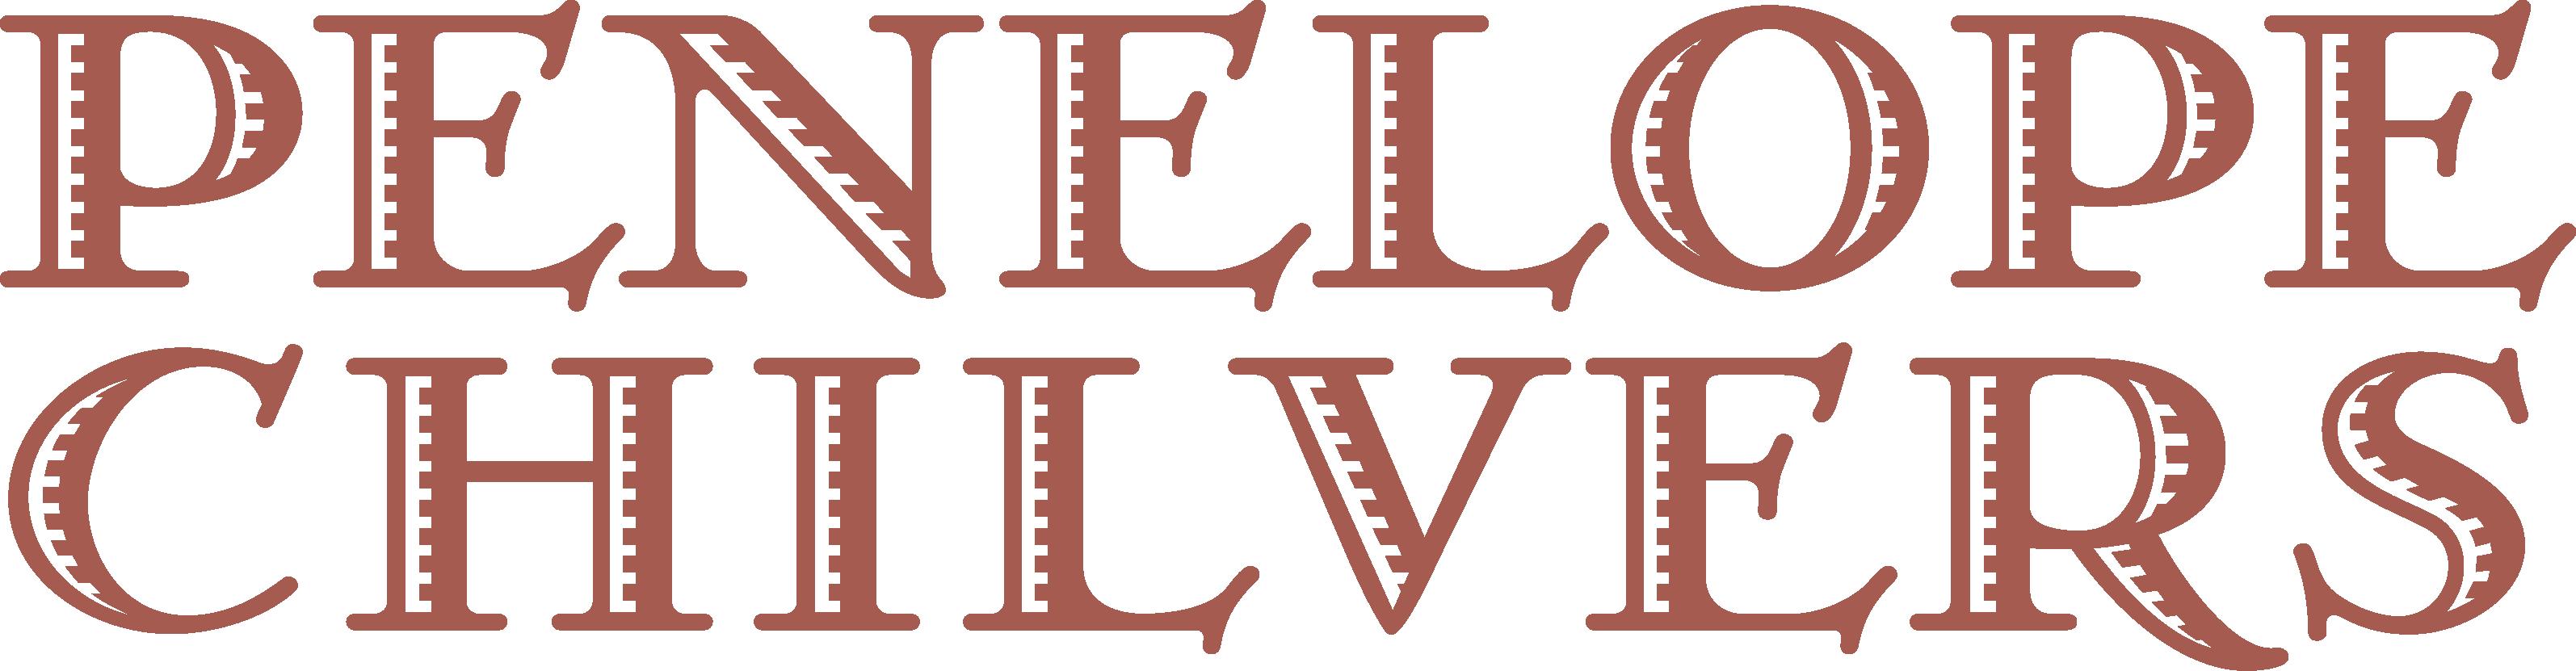 CELLO LEATHER BAG